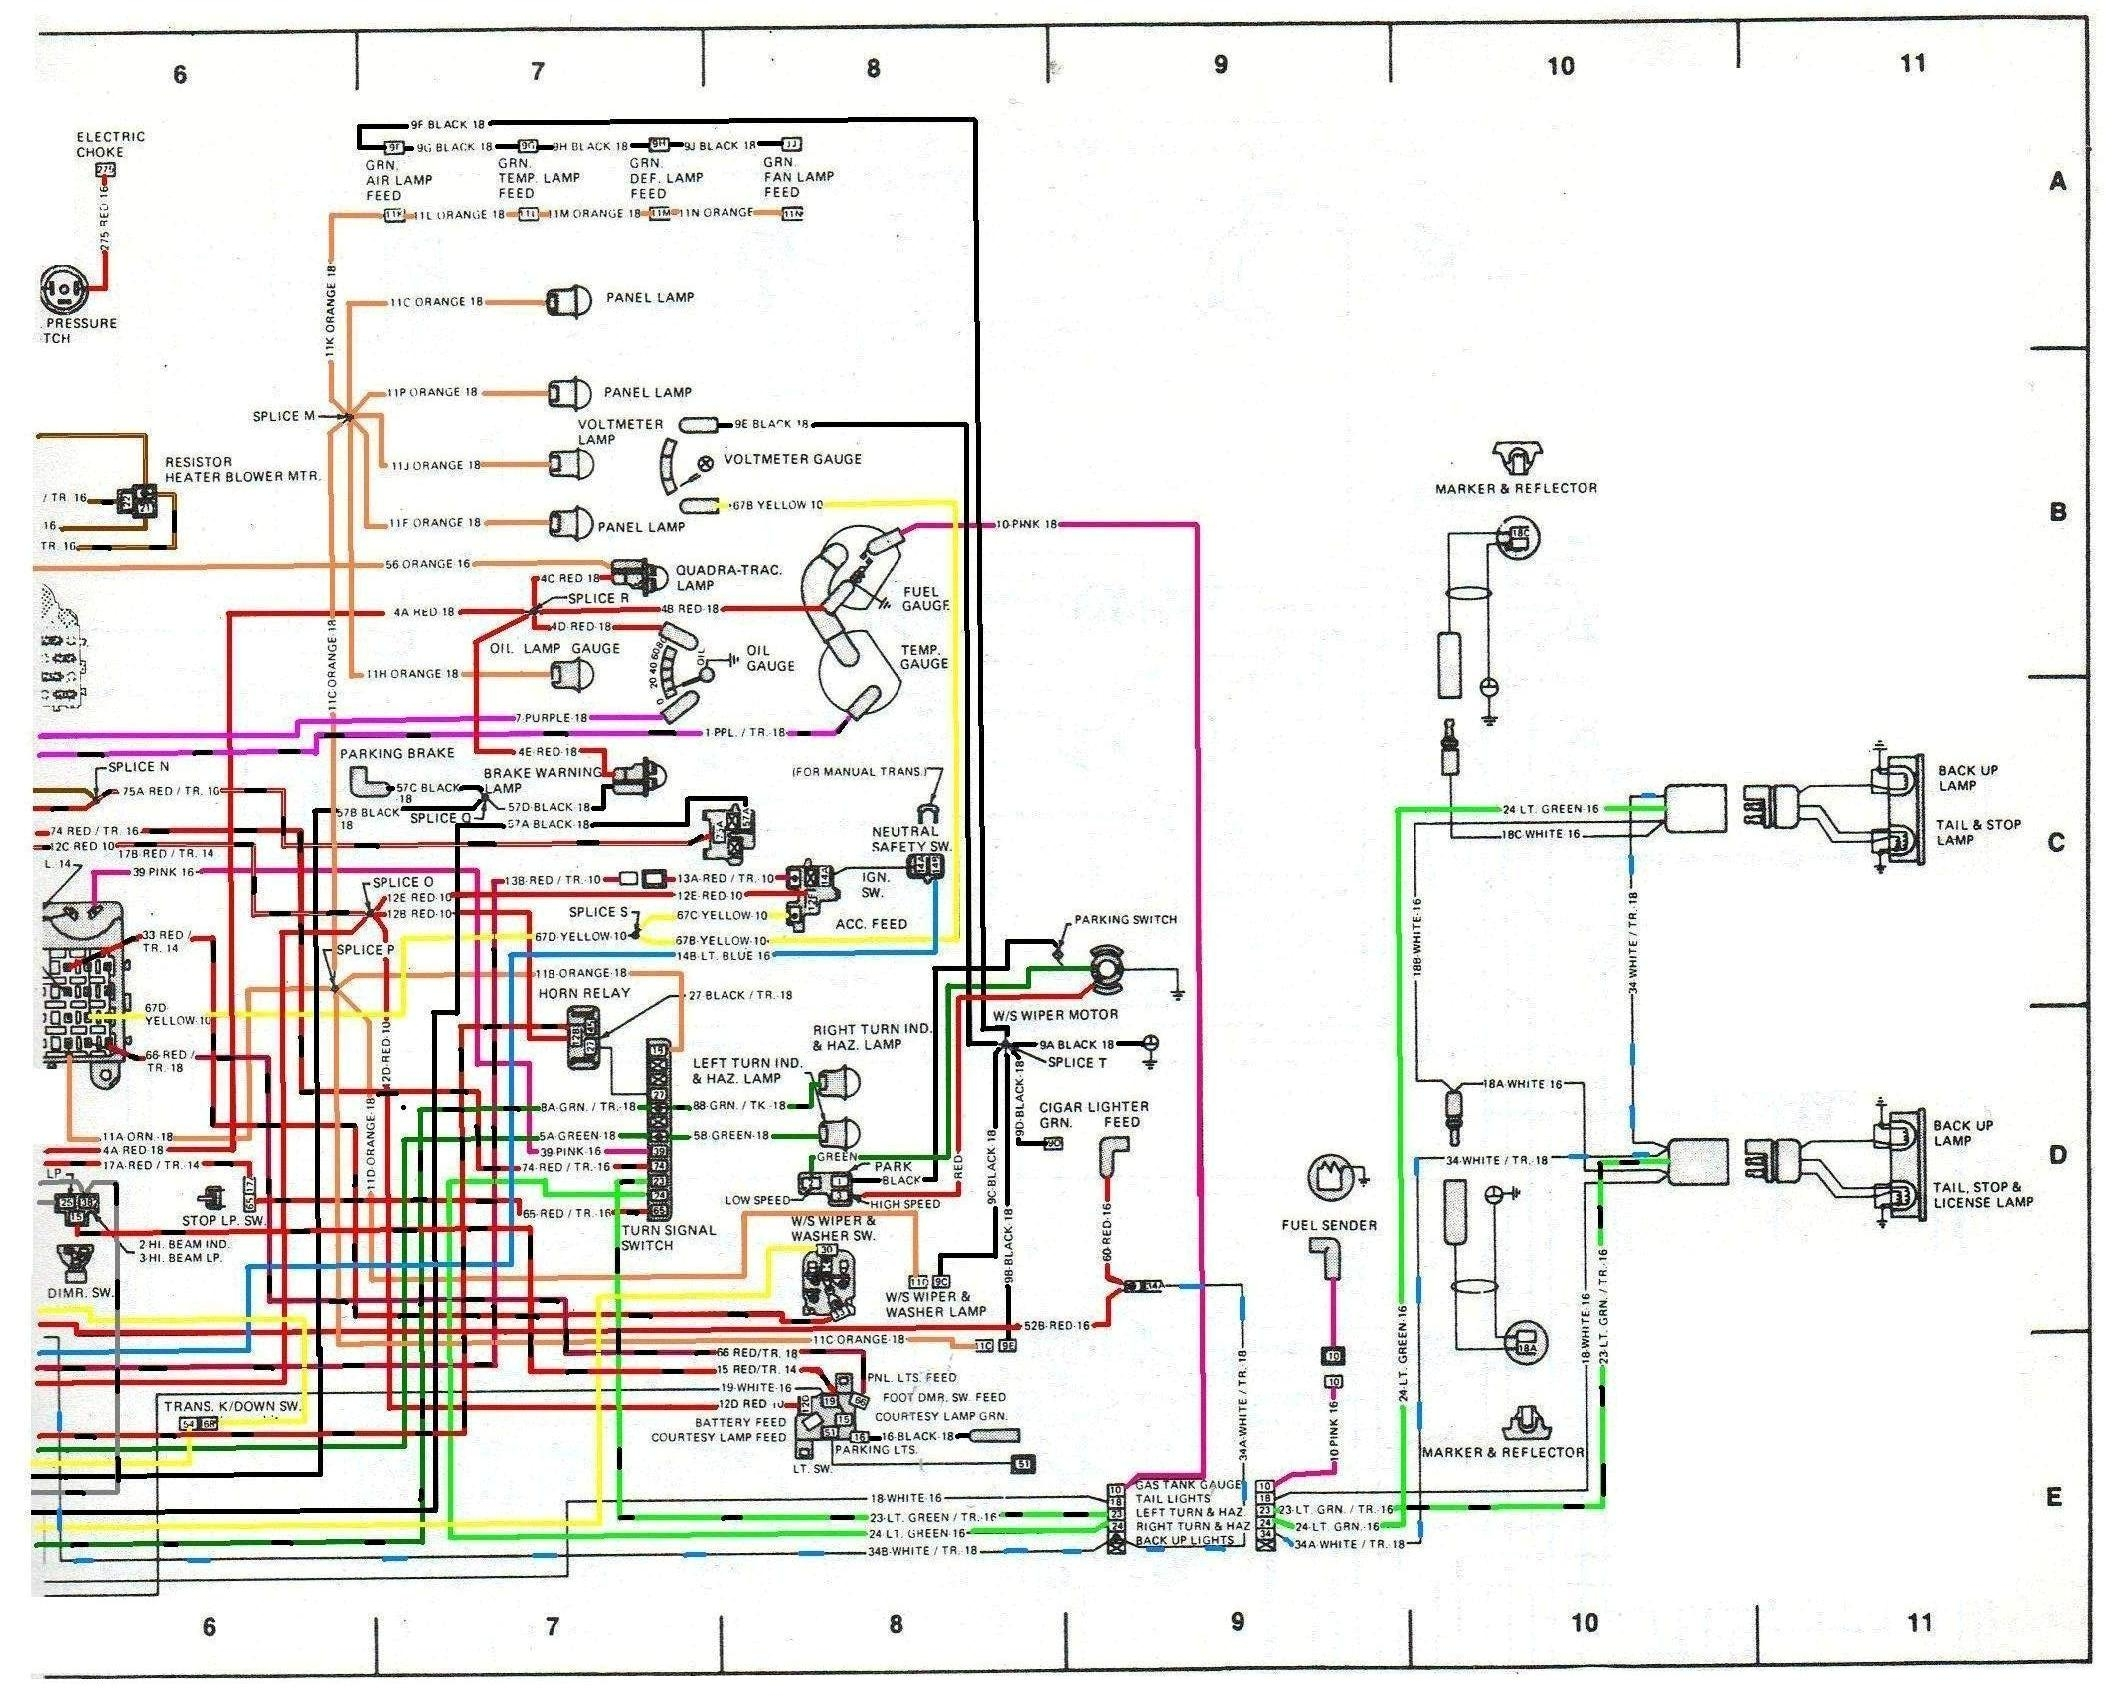 1977 jeep cj5 fuel wiring diagram all wiring diagram  78 cj5 fuel wiring diagram #1